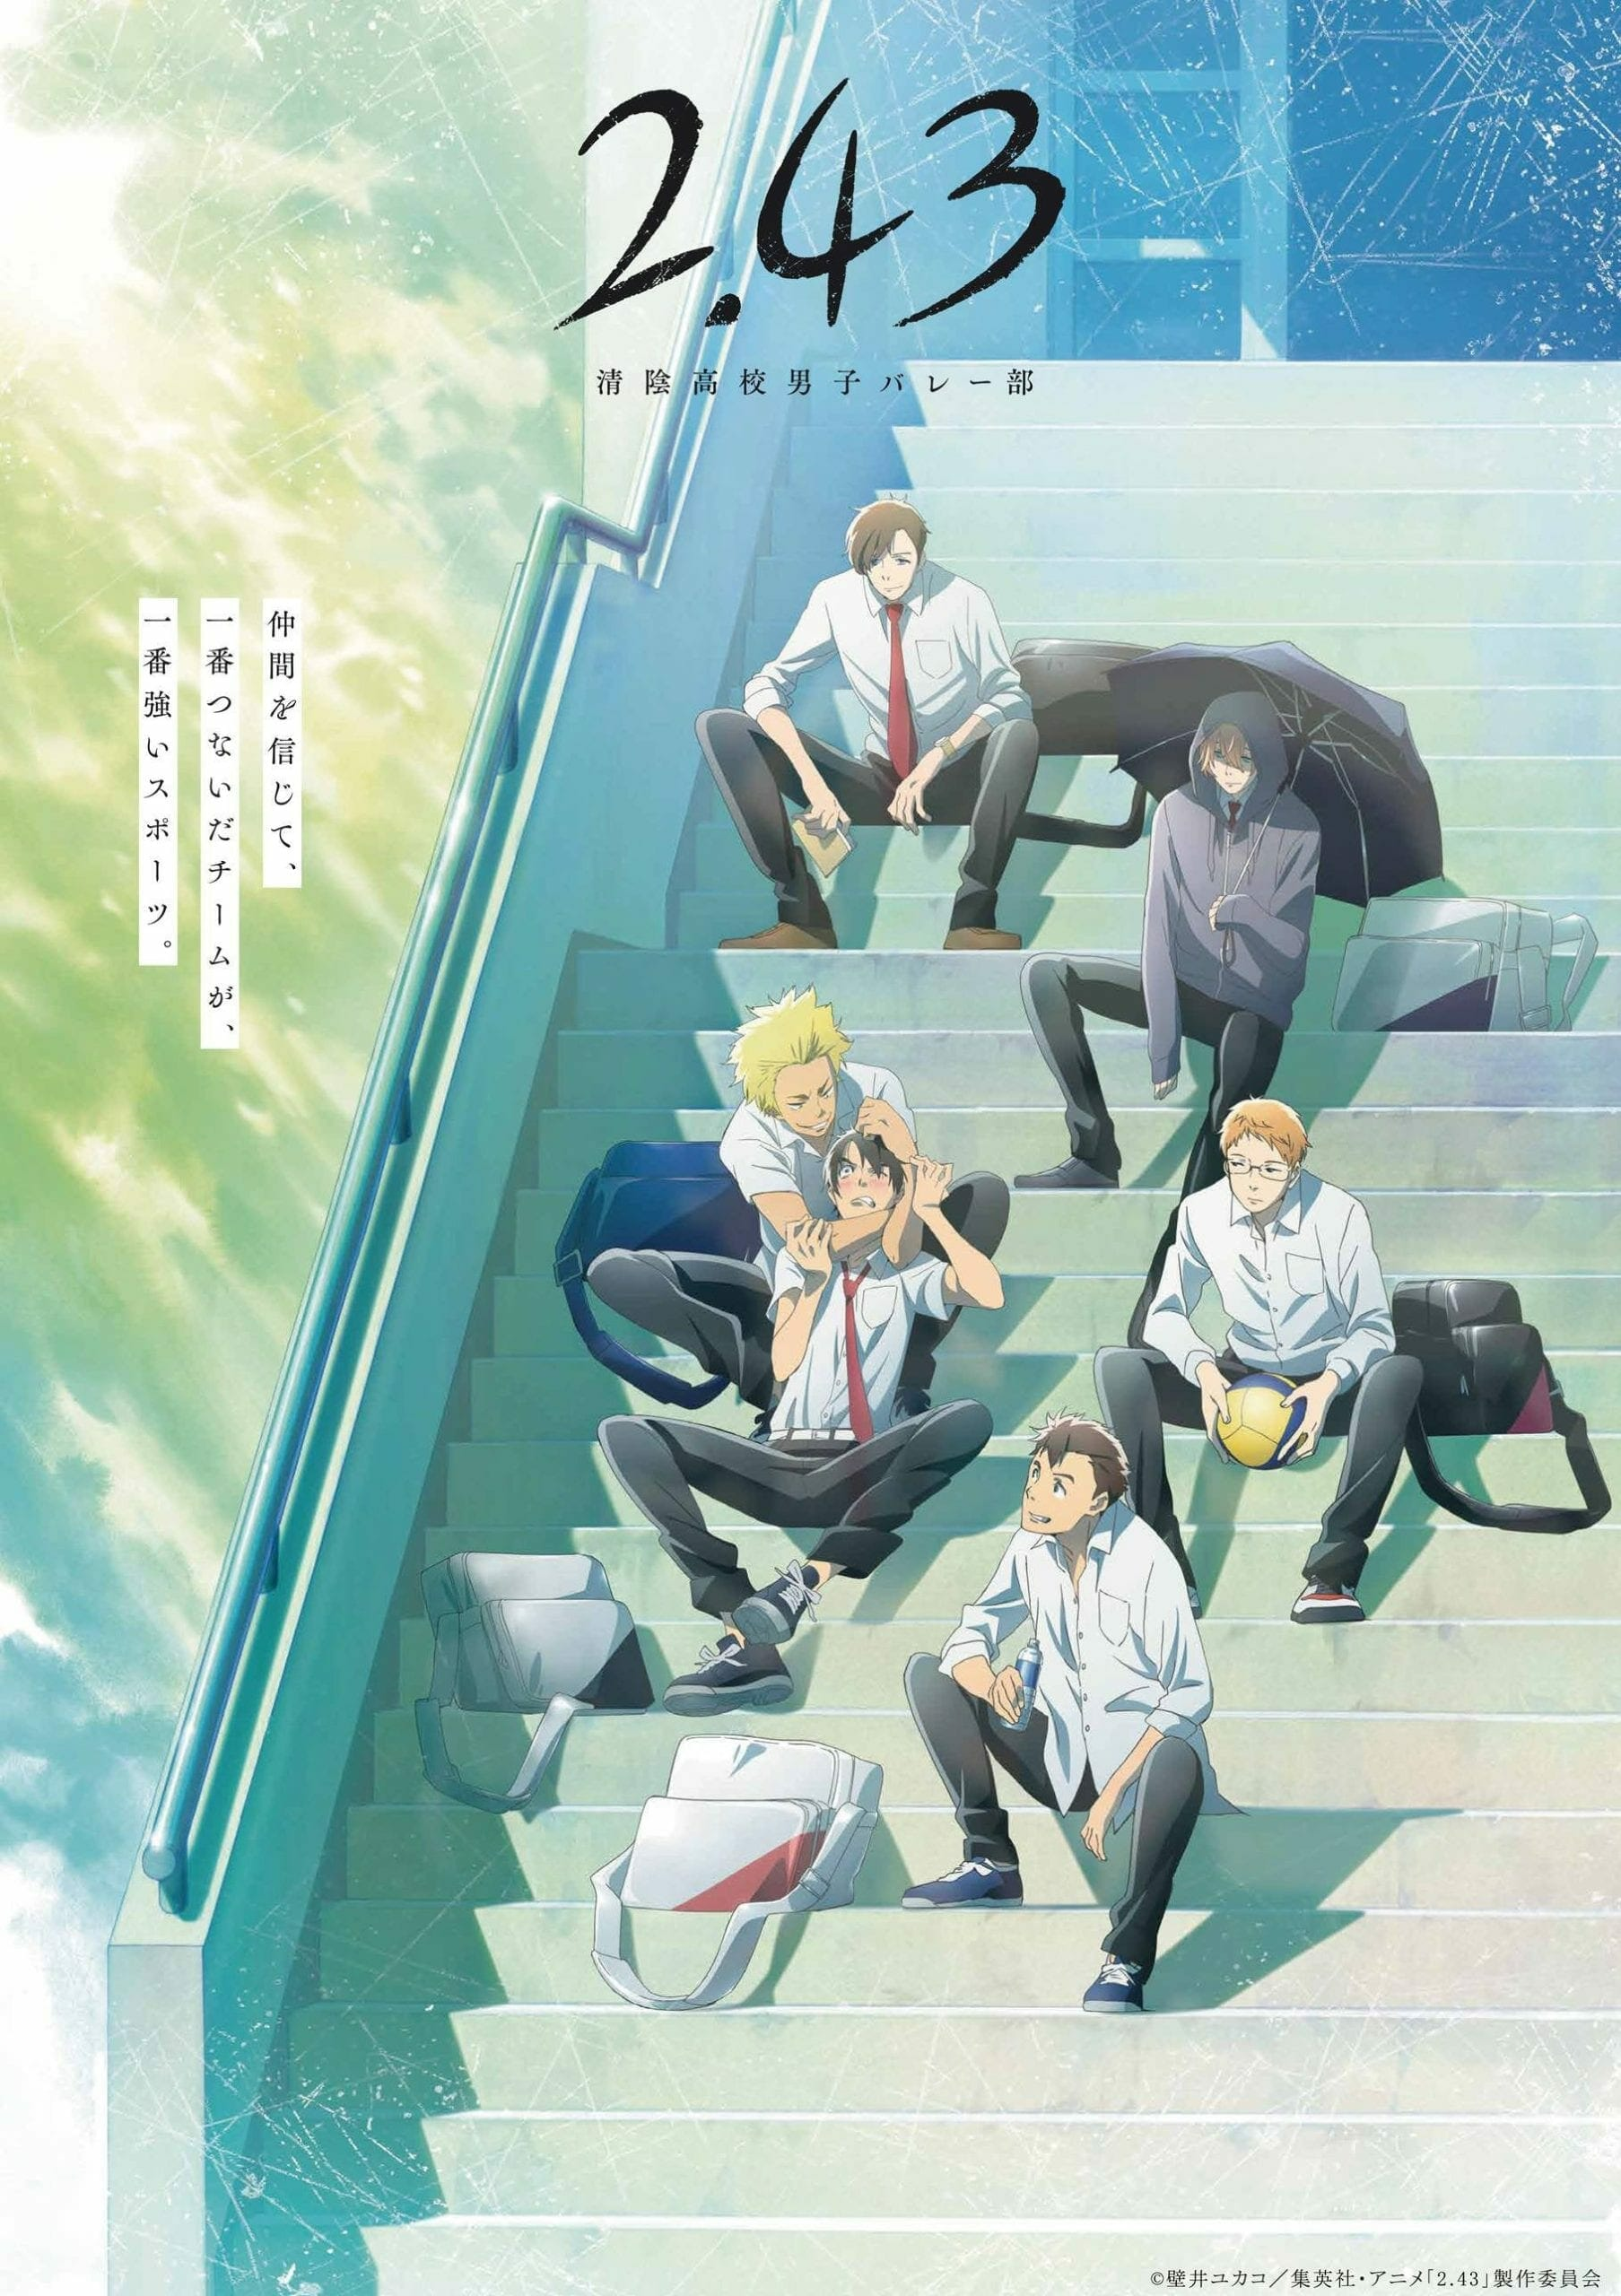 2.43: Seiin Koukou Danshi Volley-bu Anime Release date